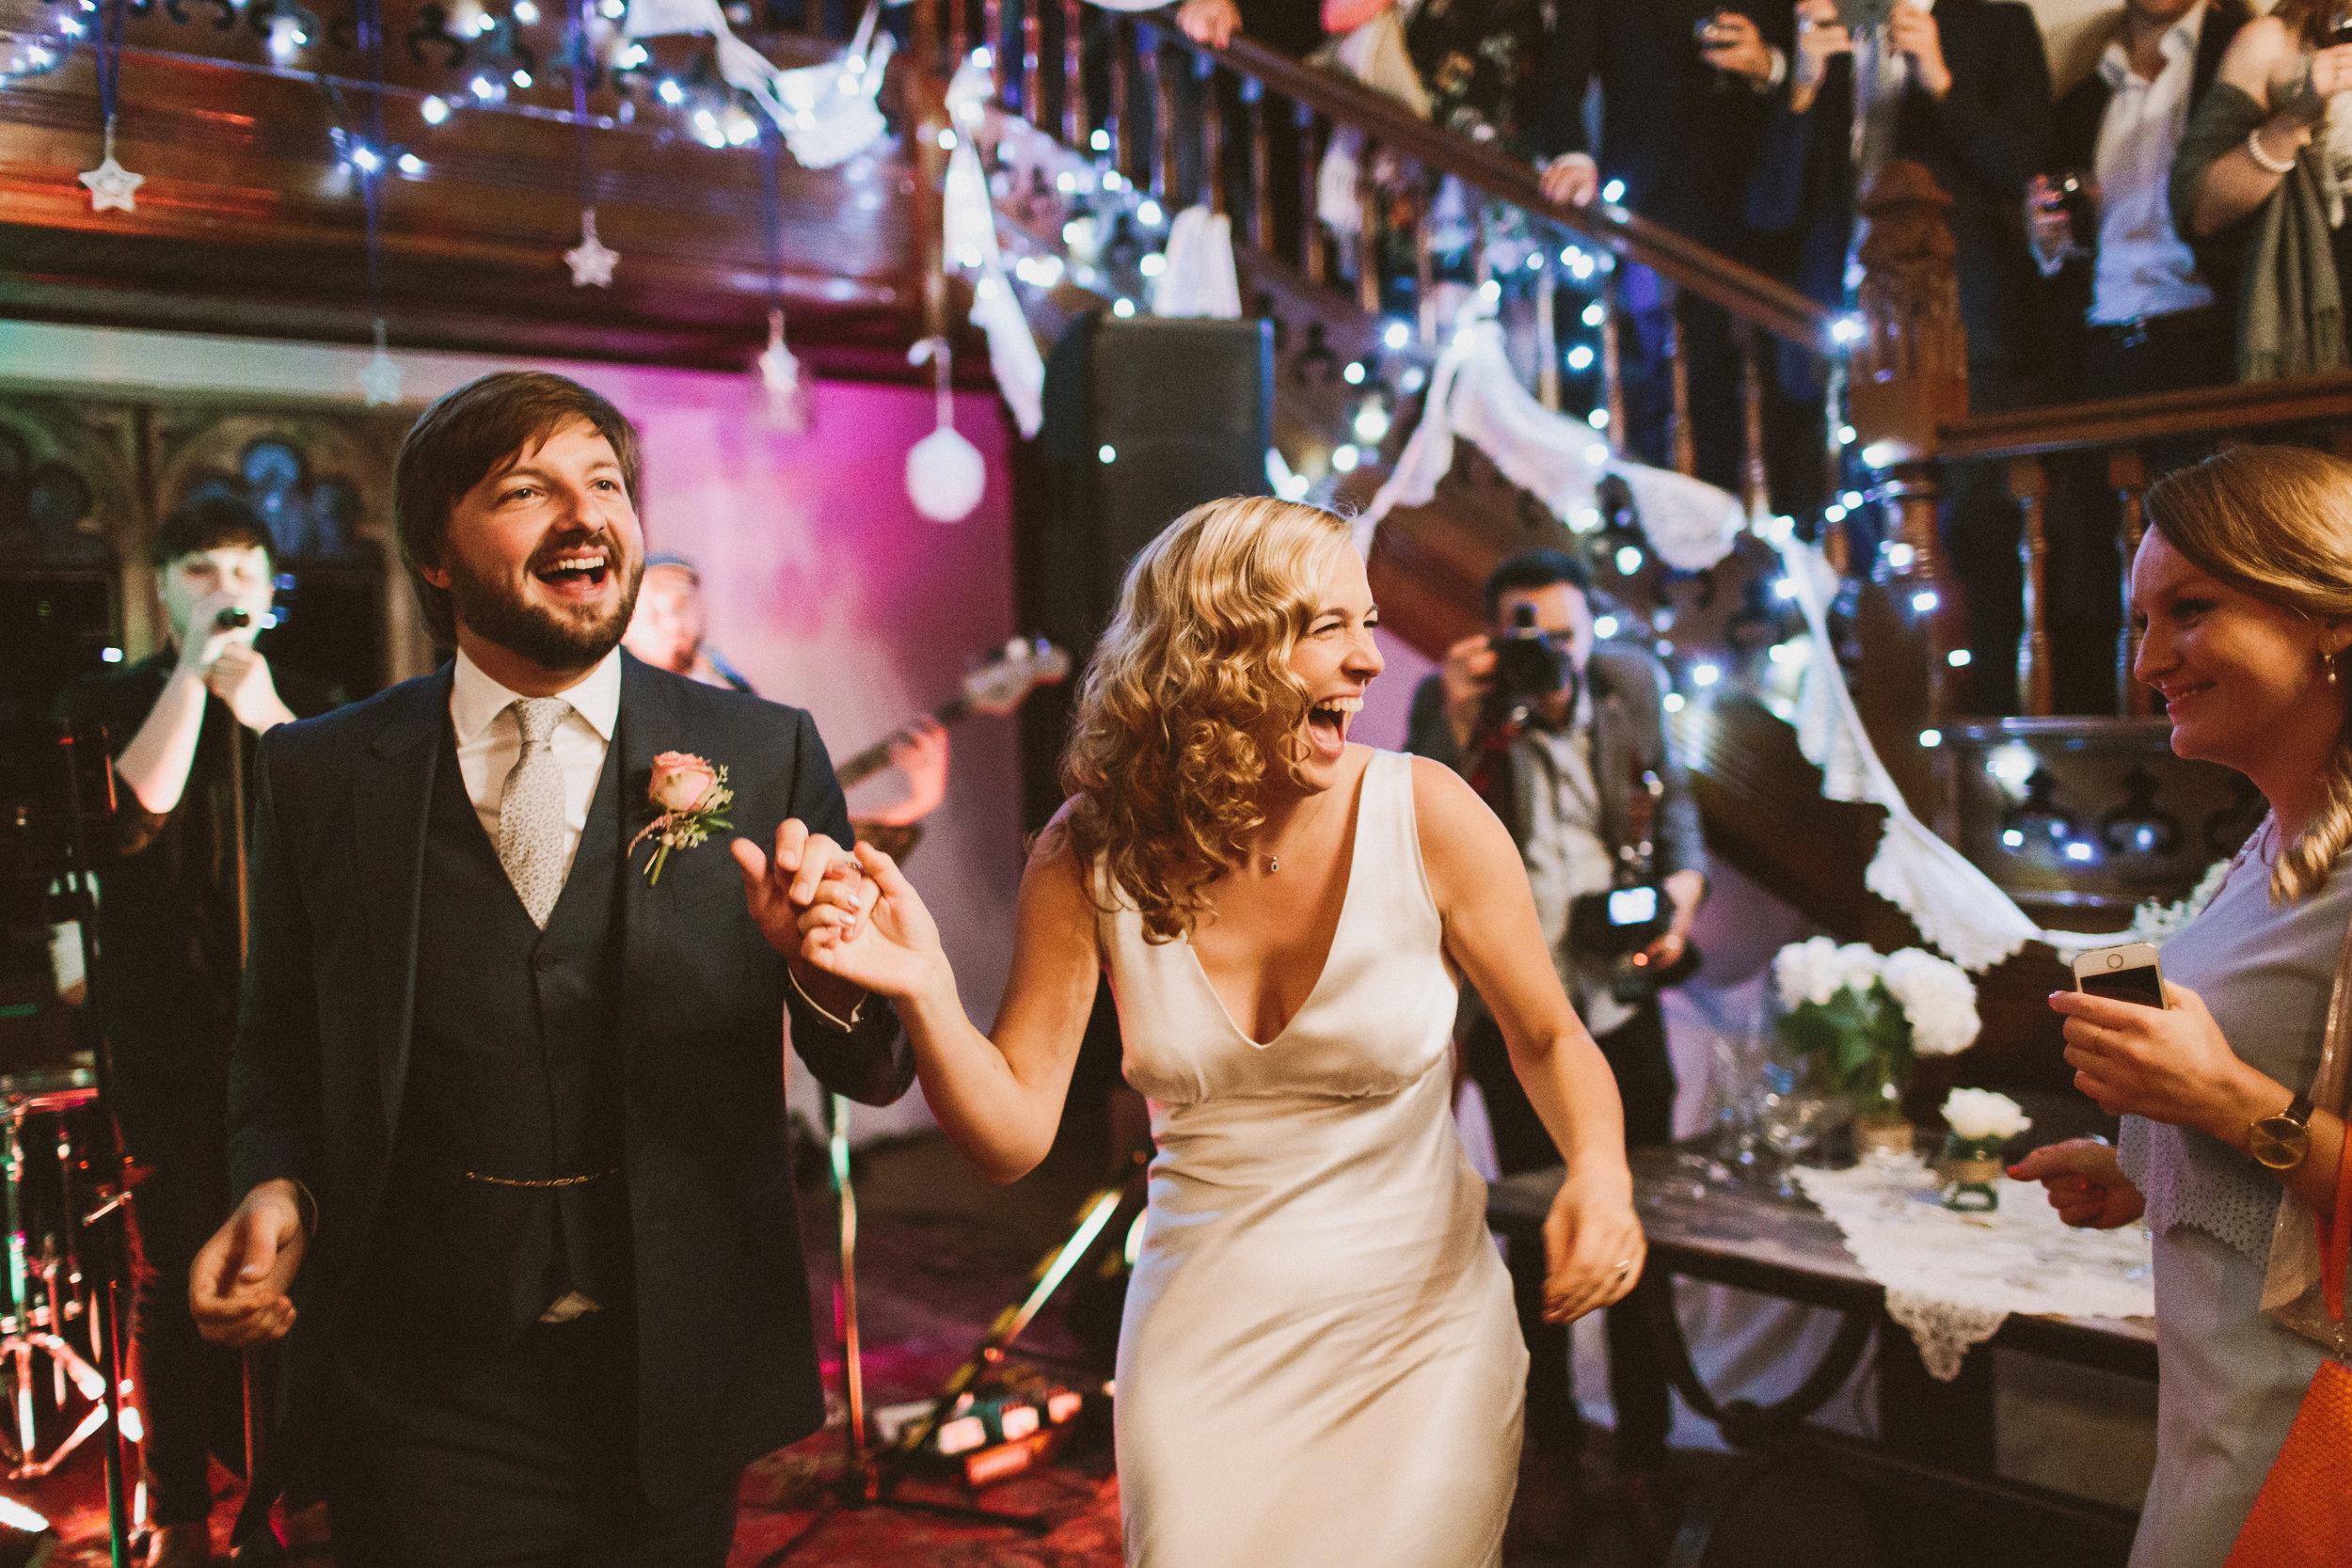 Jo-Peak-District-Autumn-Wedding-Bespoke-Vintage-Bias-Wedding-Gown-Lace-Jacket-Susanna-Greening-Matlock-20